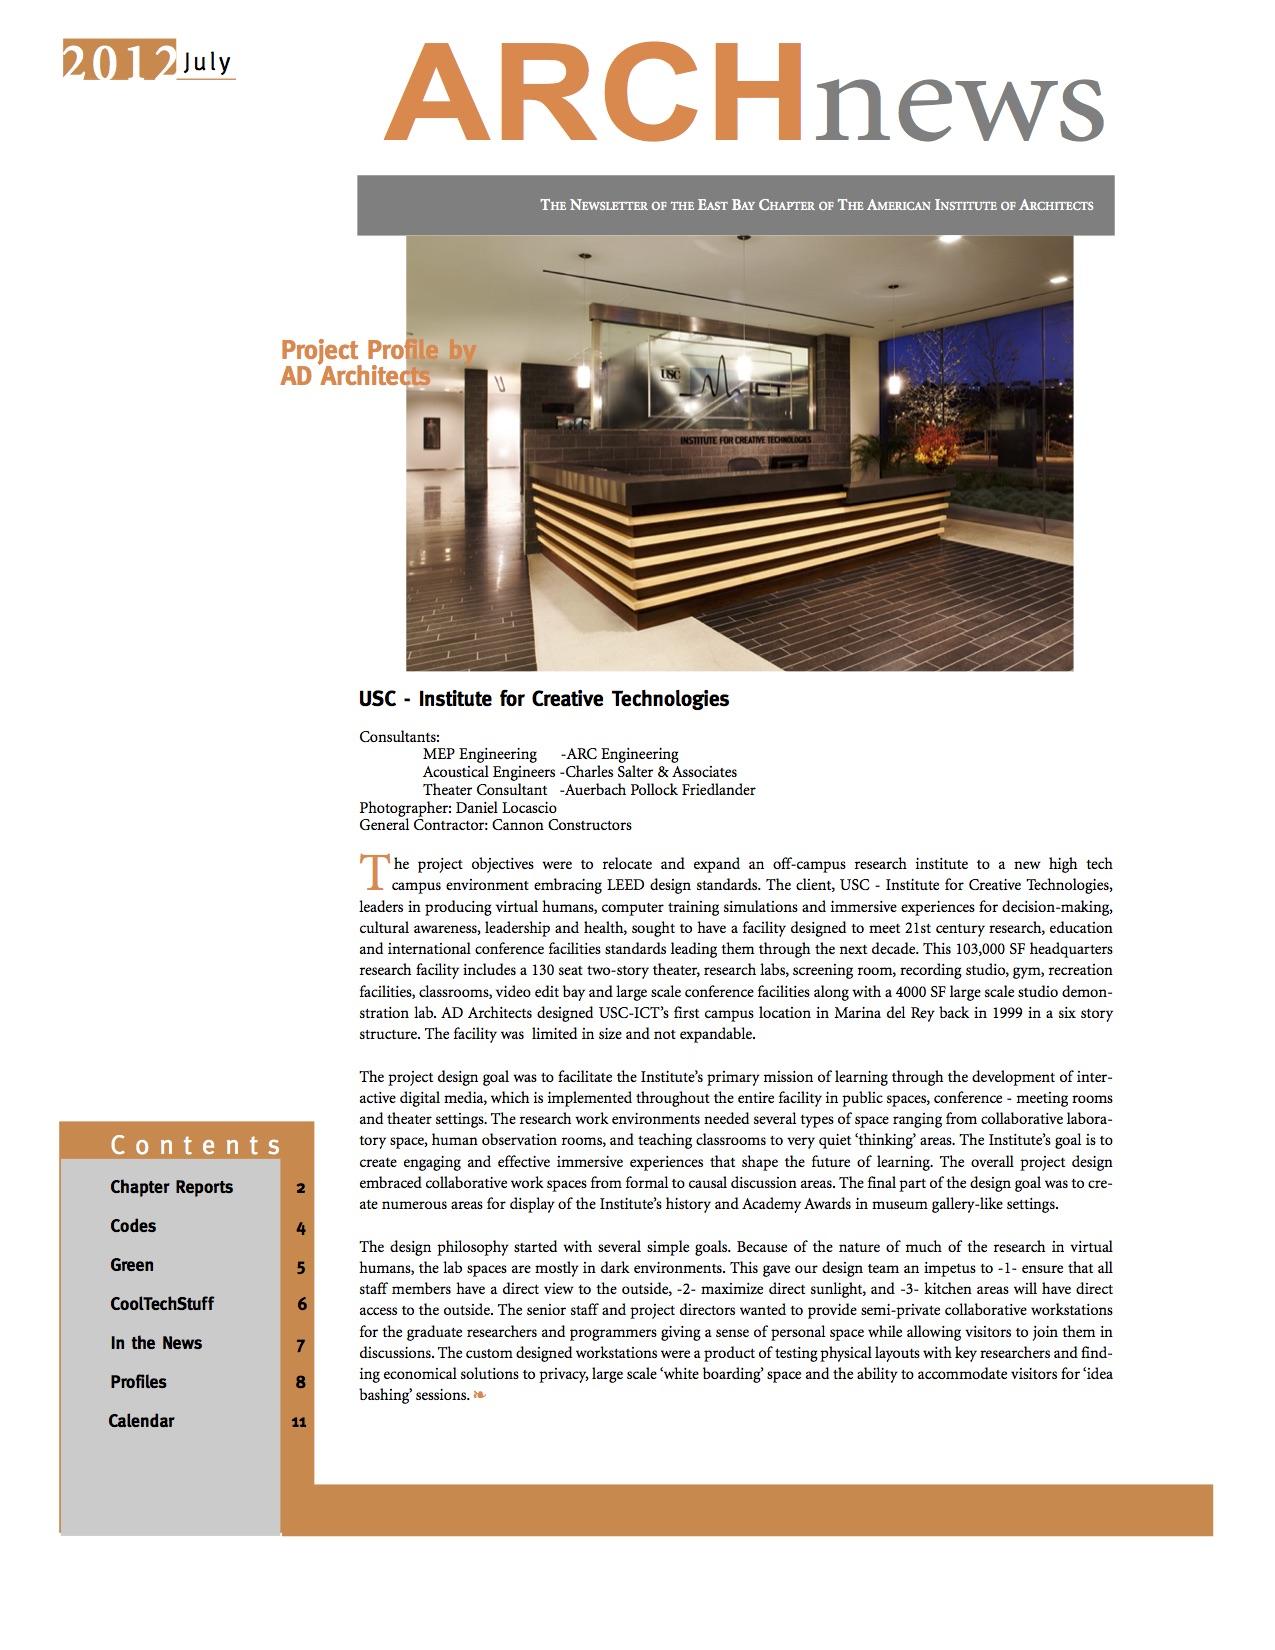 AD Firm Profile Jan09ARCHnews 2.jpg